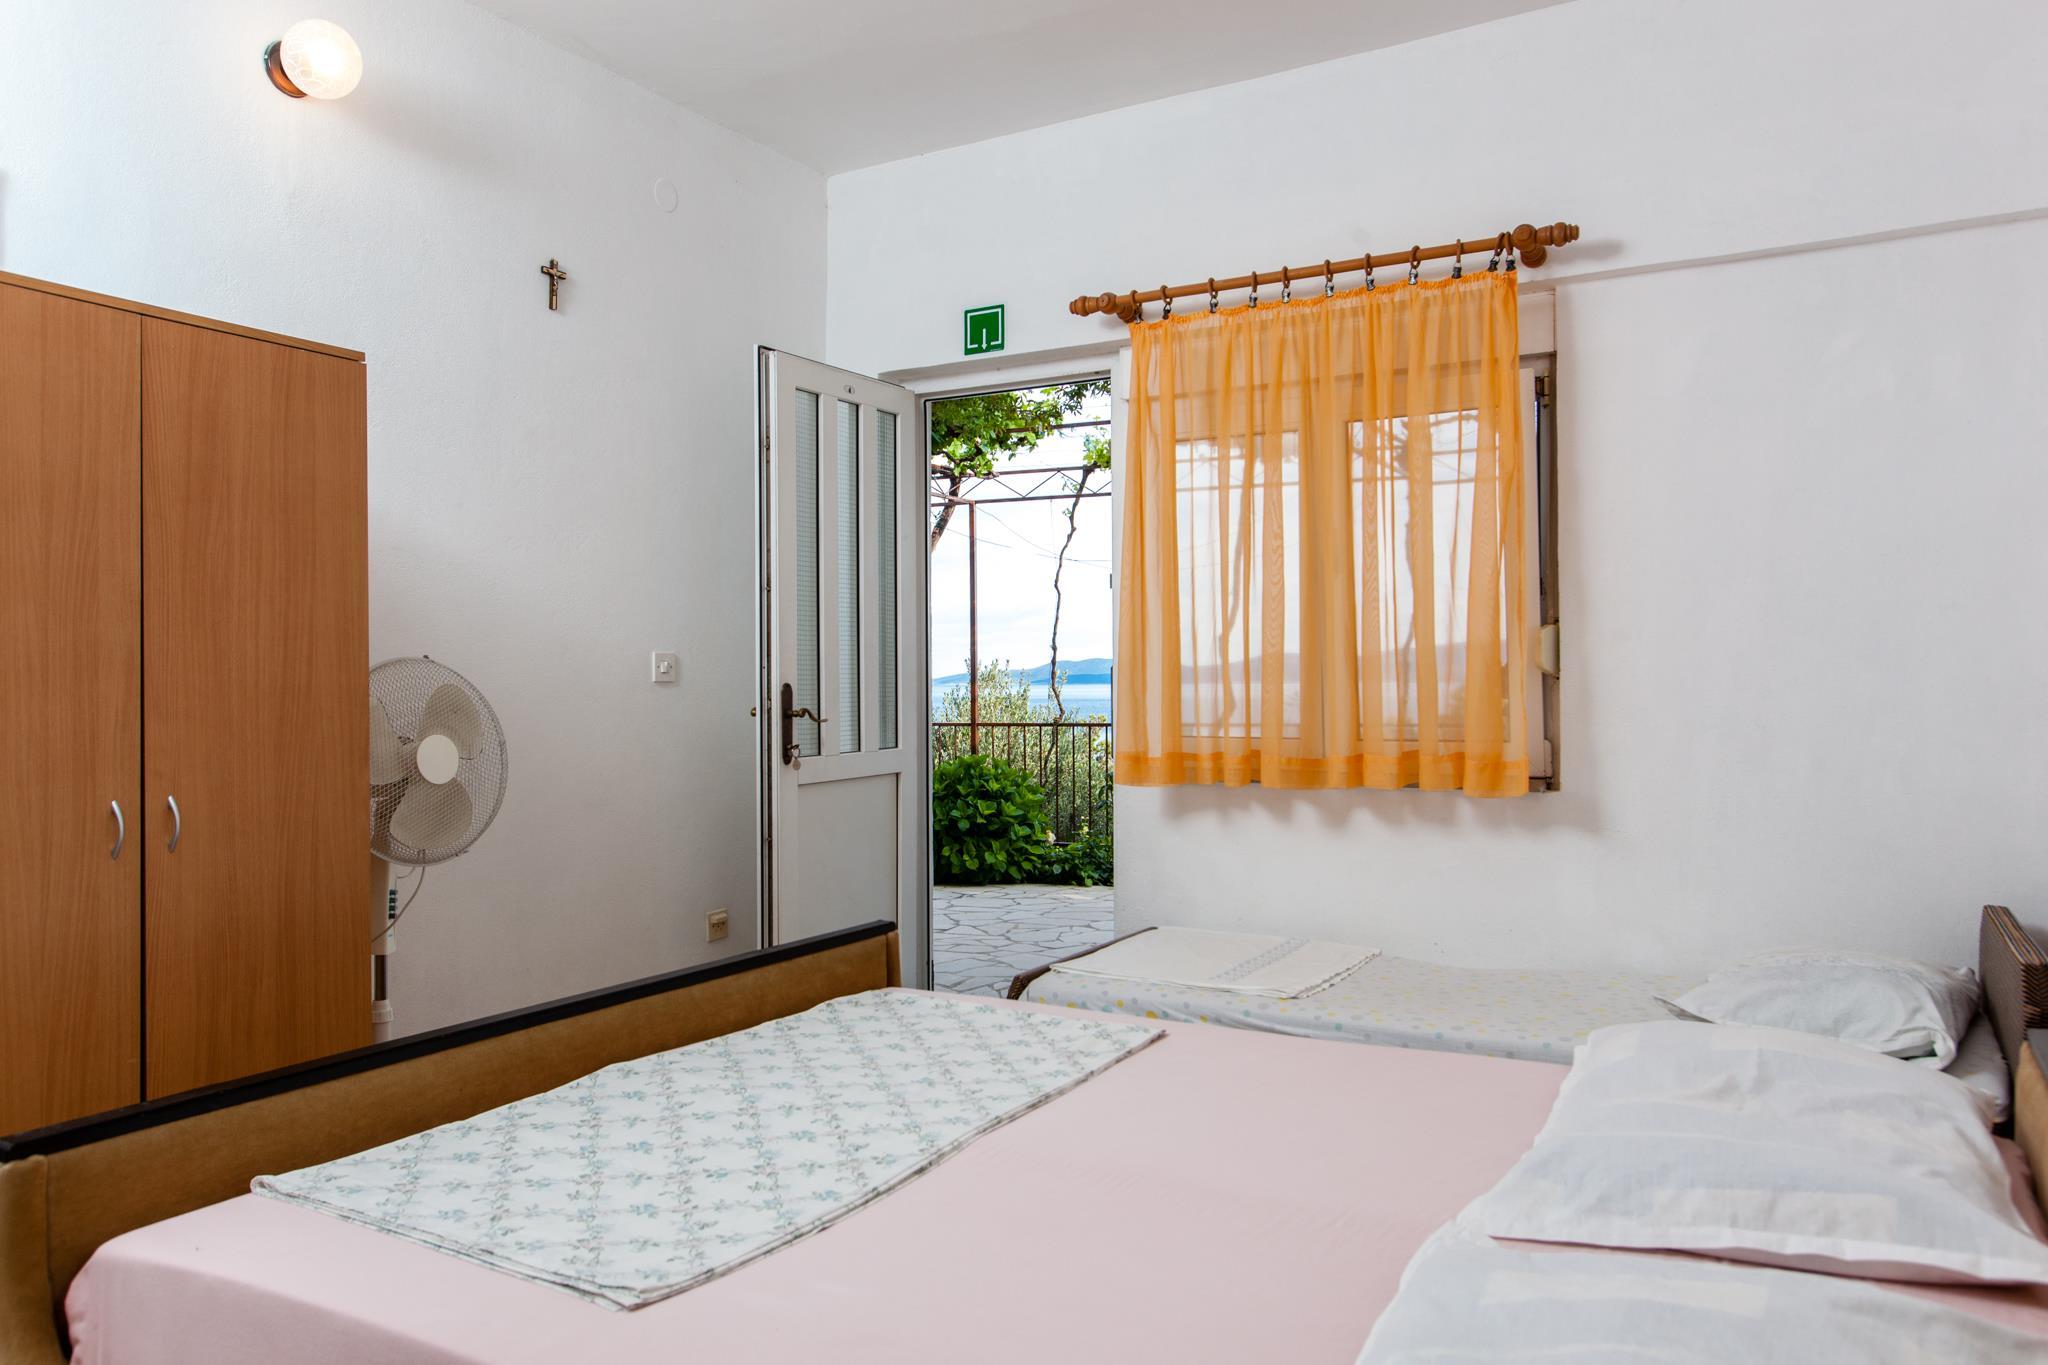 Ferienwohnung Apartments Bla~enka / A3 / One Bedroom (1928327), Lokva Rogoznica, , Dalmatien, Kroatien, Bild 17